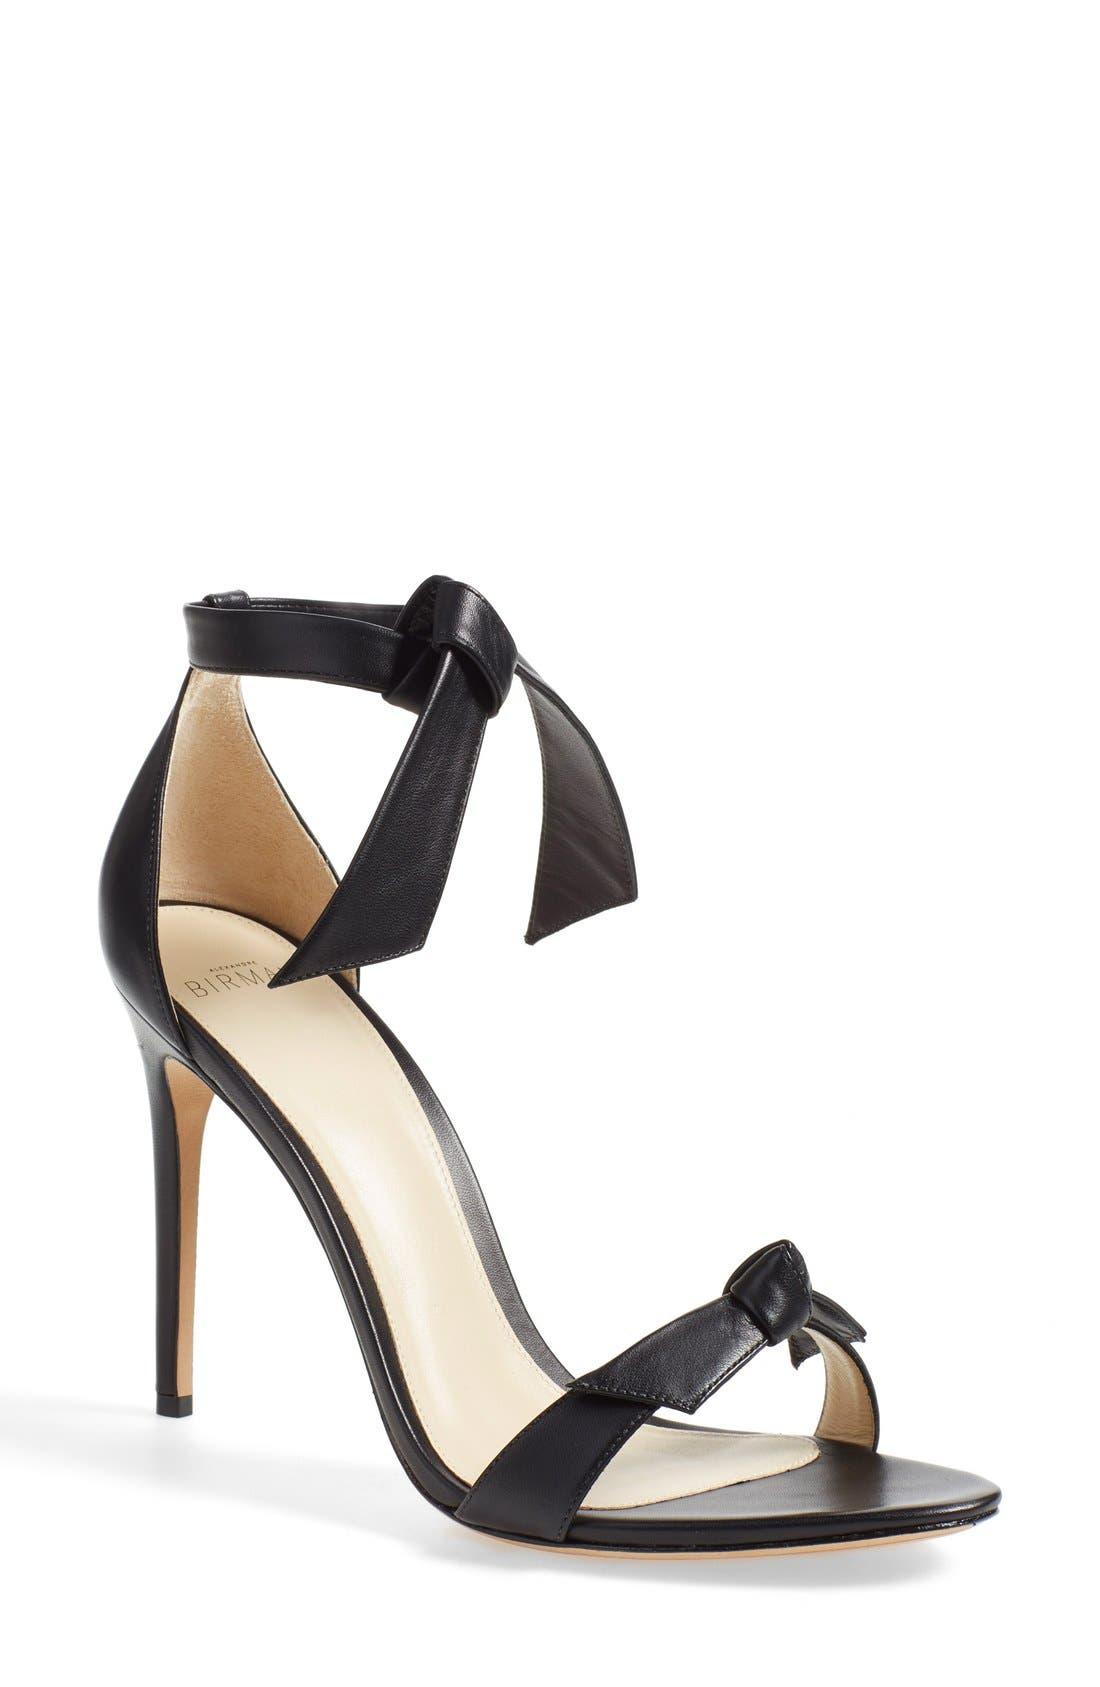 ALEXANDRE BIRMAN,                             'Clarita' Ankle Tie Sandal,                             Main thumbnail 1, color,                             BLACK LEATHER